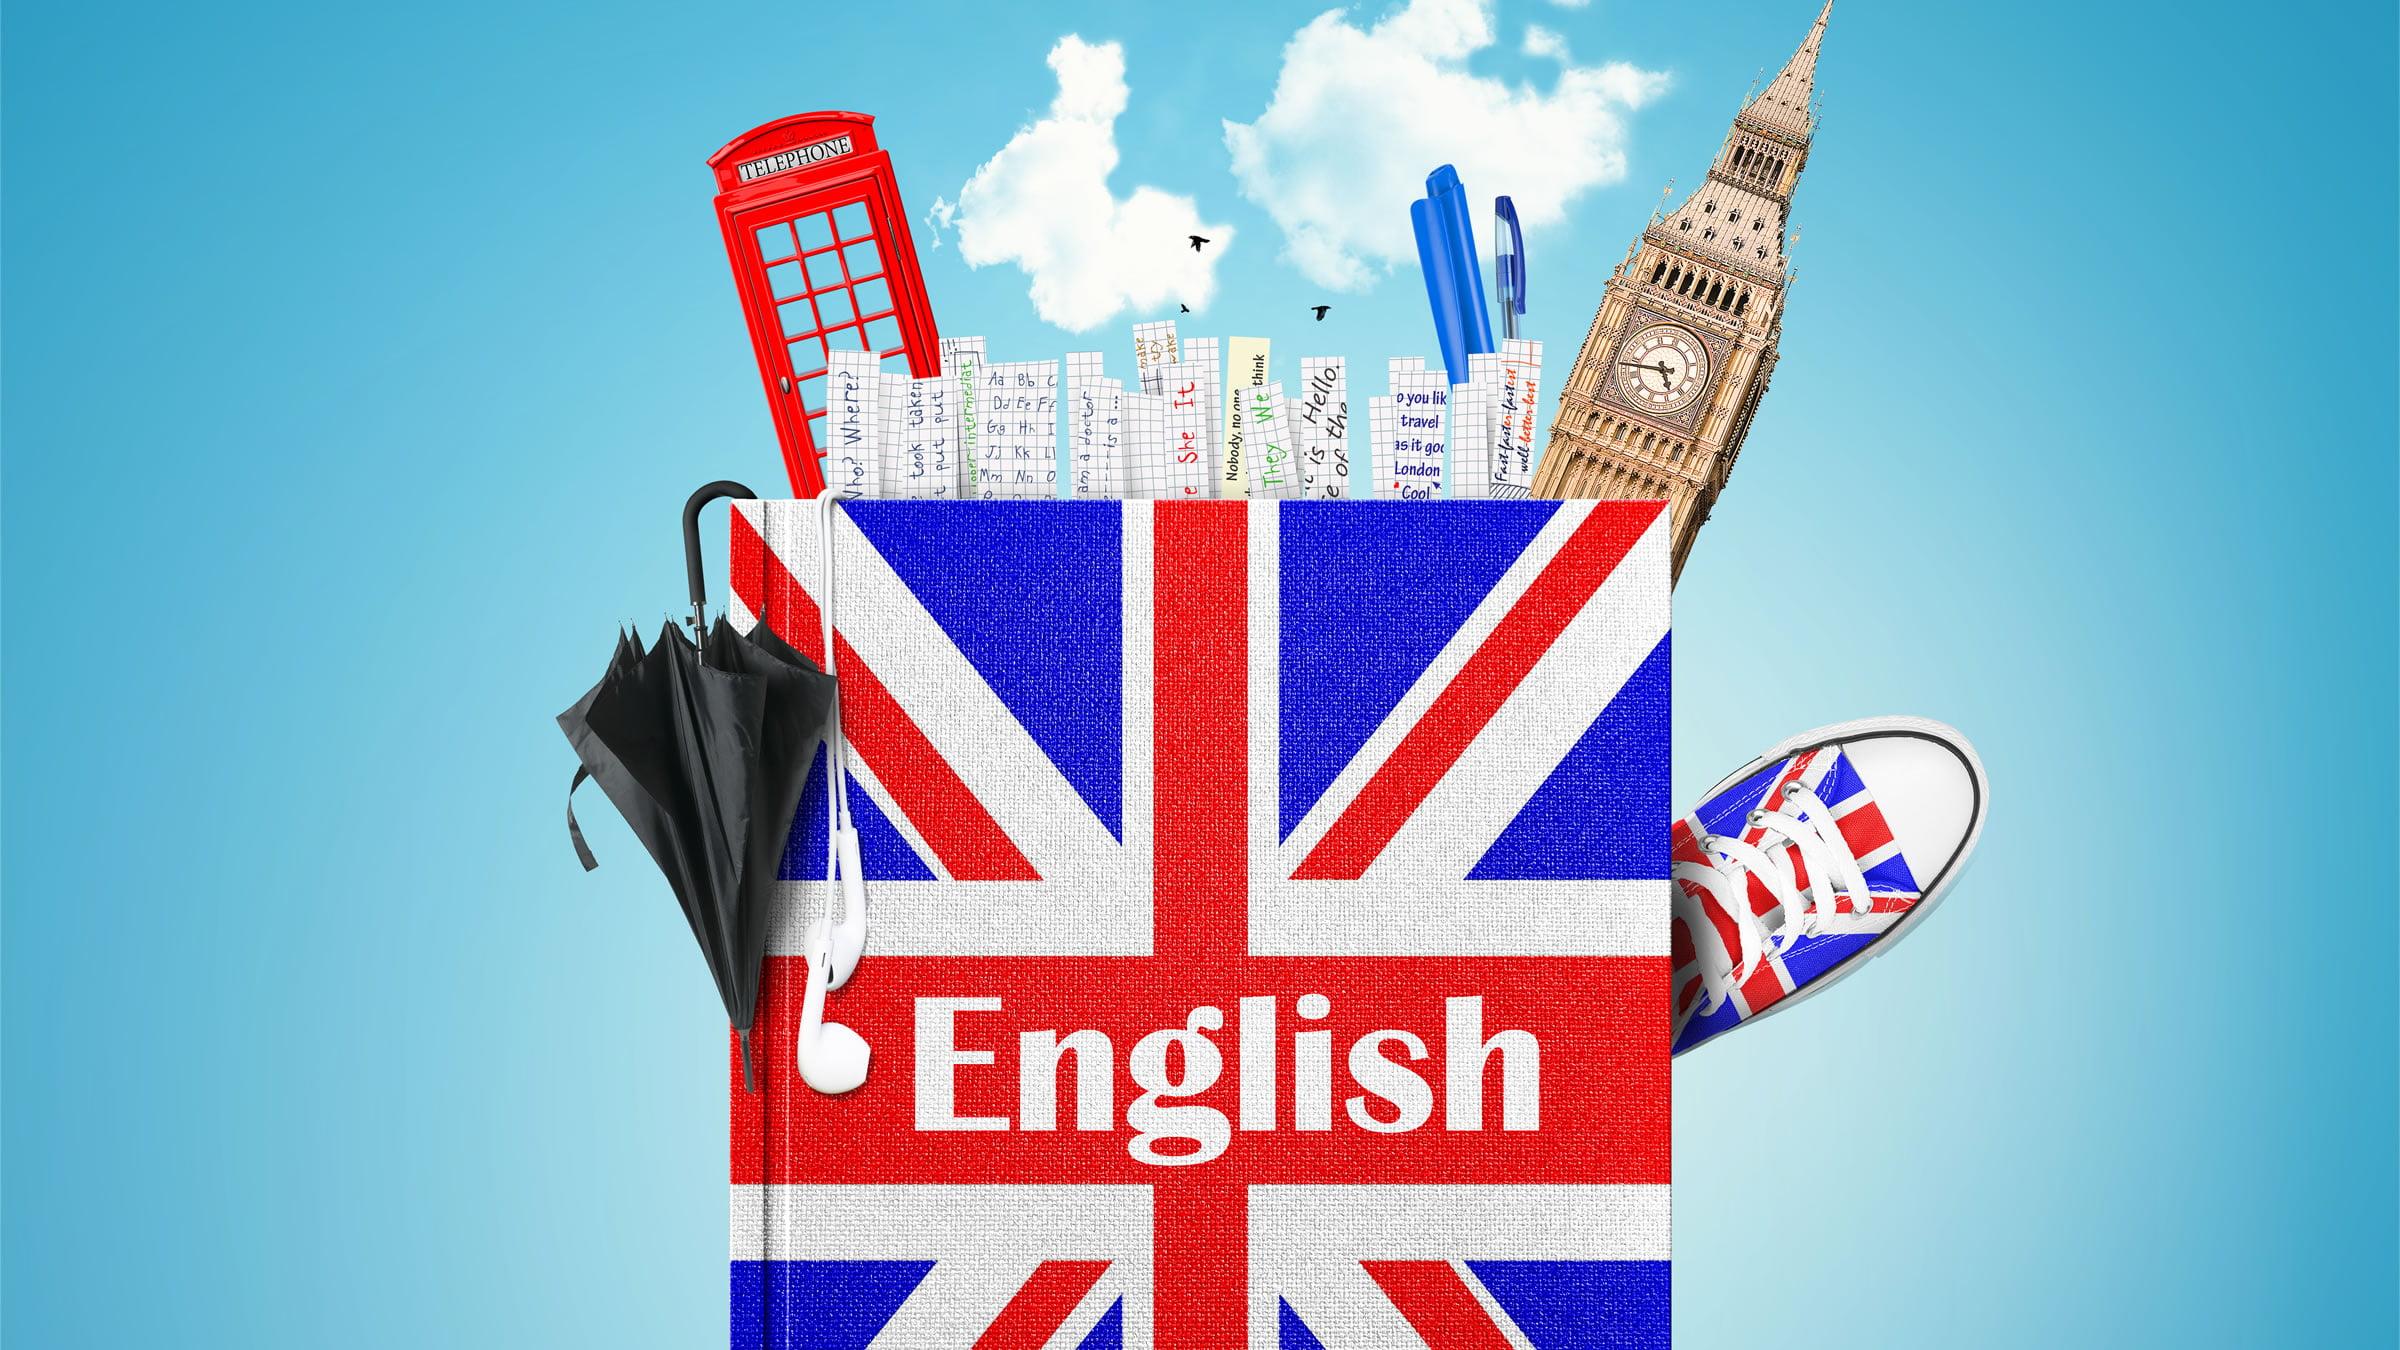 El inglés: la lengua oficial del Reino Unido